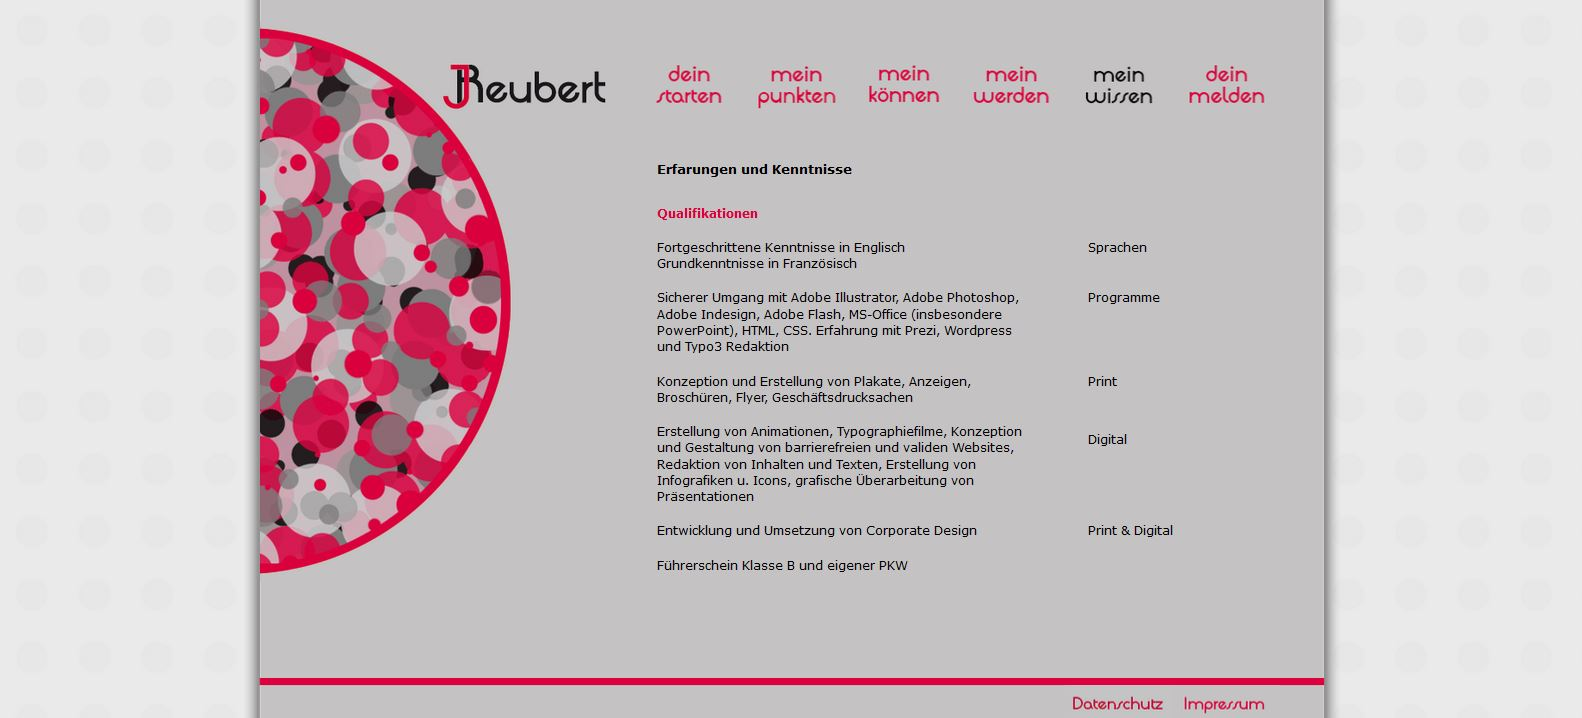 Website JReubert alt Qualifikationen